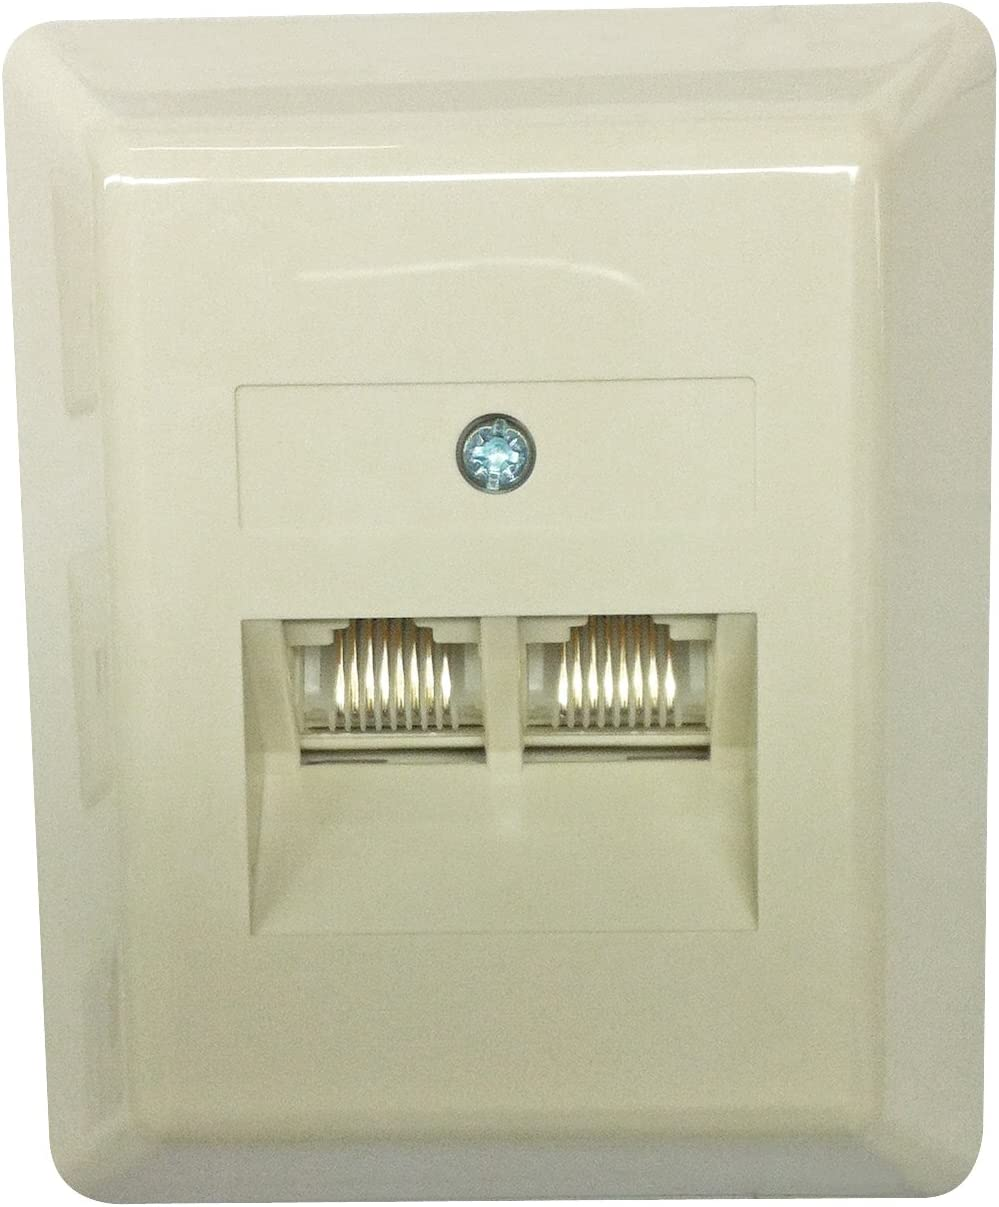 2 x 8-polig Kopp 33369404 UAE-Anschlussdose